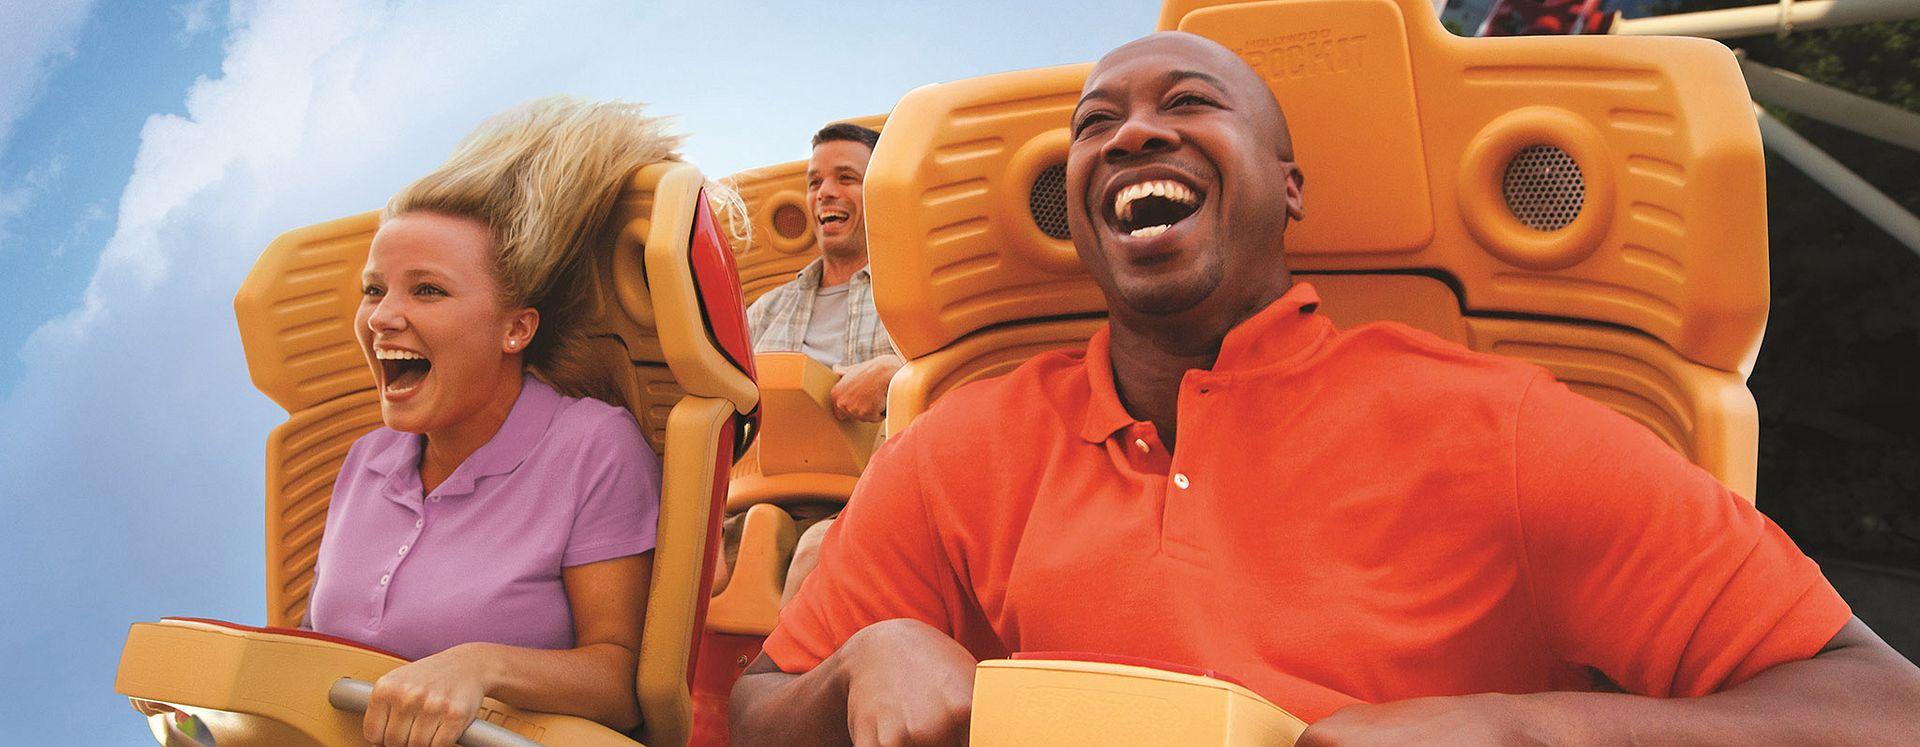 Guests riding the Hollywood Rip Ride Rockit roller coaster at Universal Studios Florida